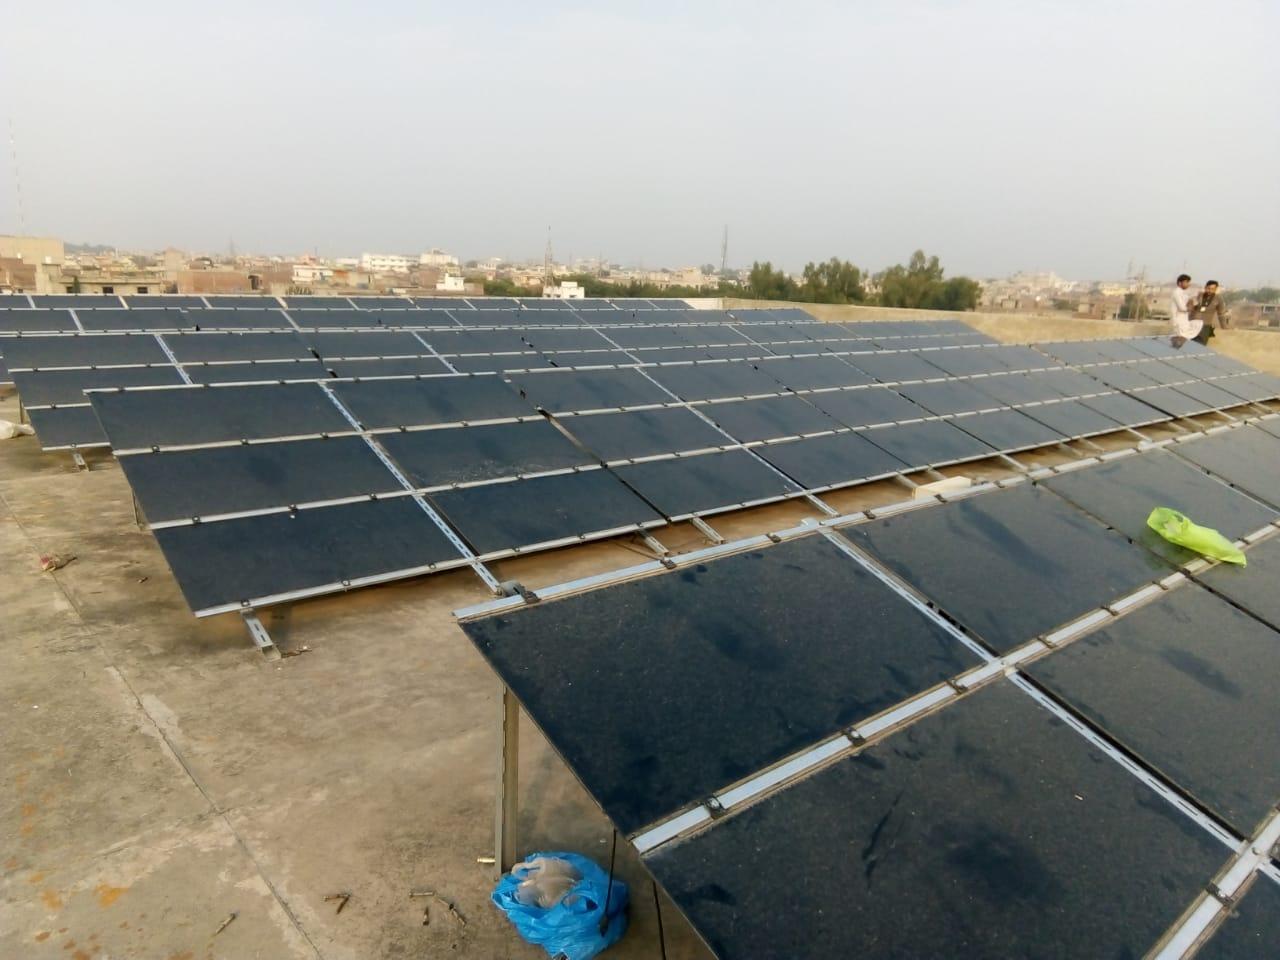 Anwar Khawaja Industries